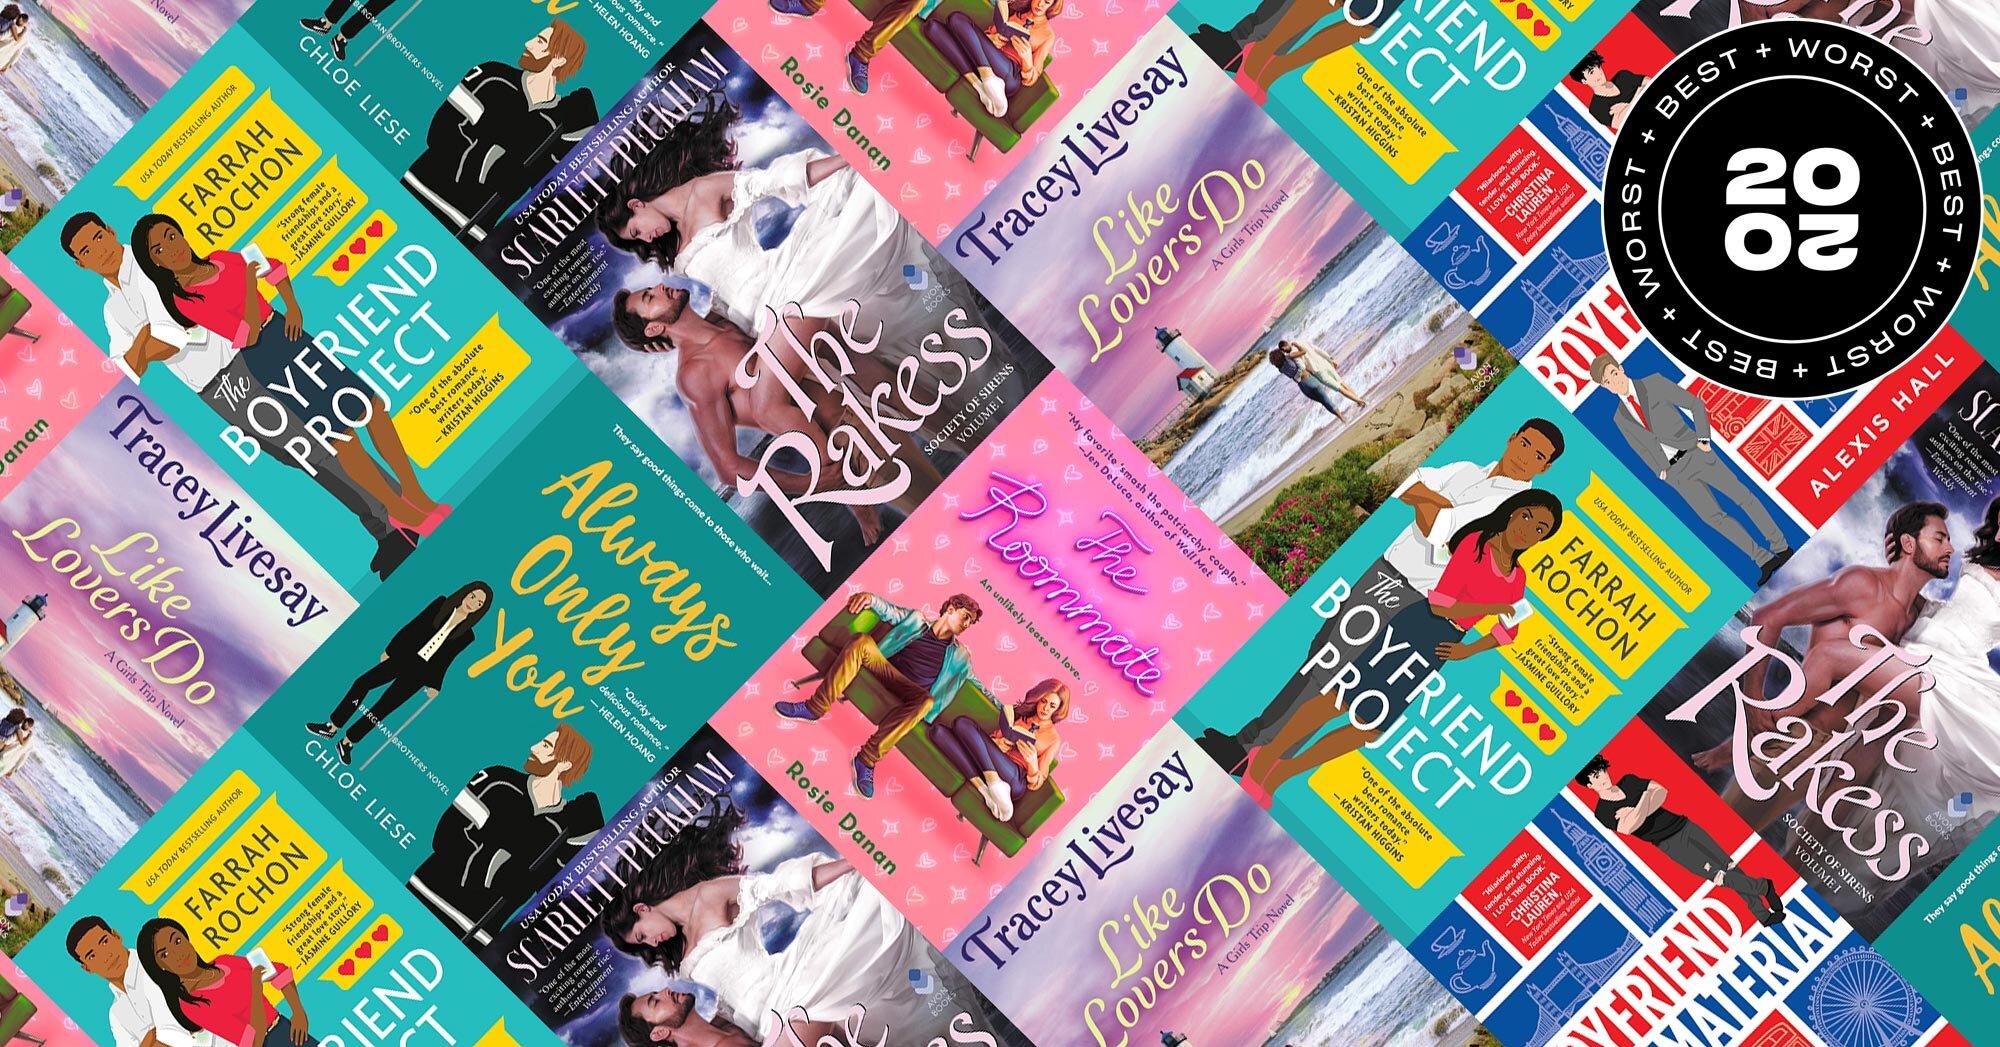 The 10 best romance novels of 2020